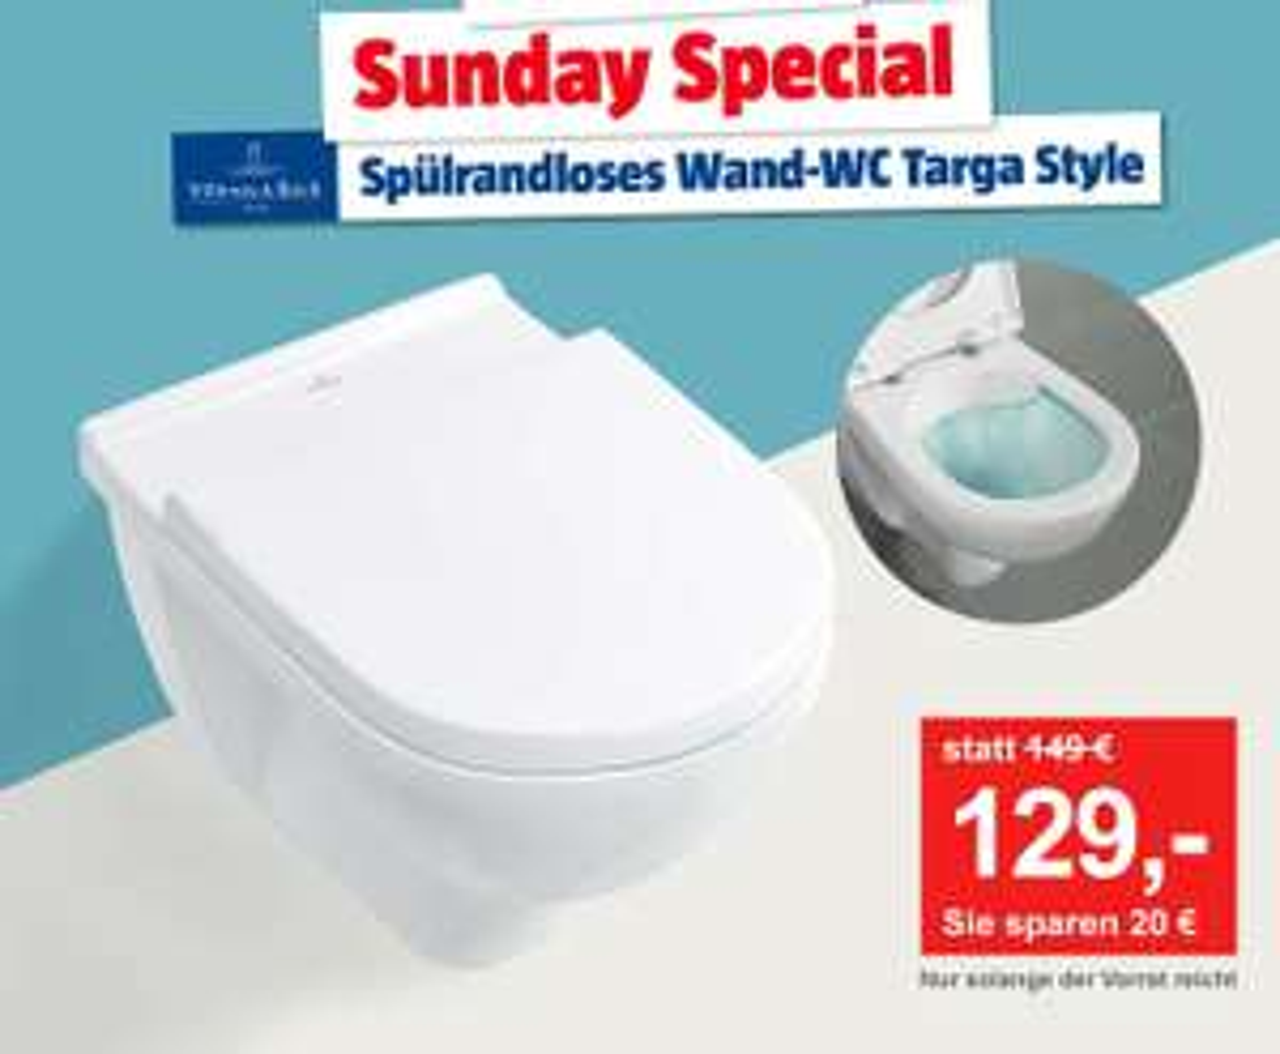 BAUHAUS - Villeroy & Boch Spülrandloses Wand-WC Targa Style